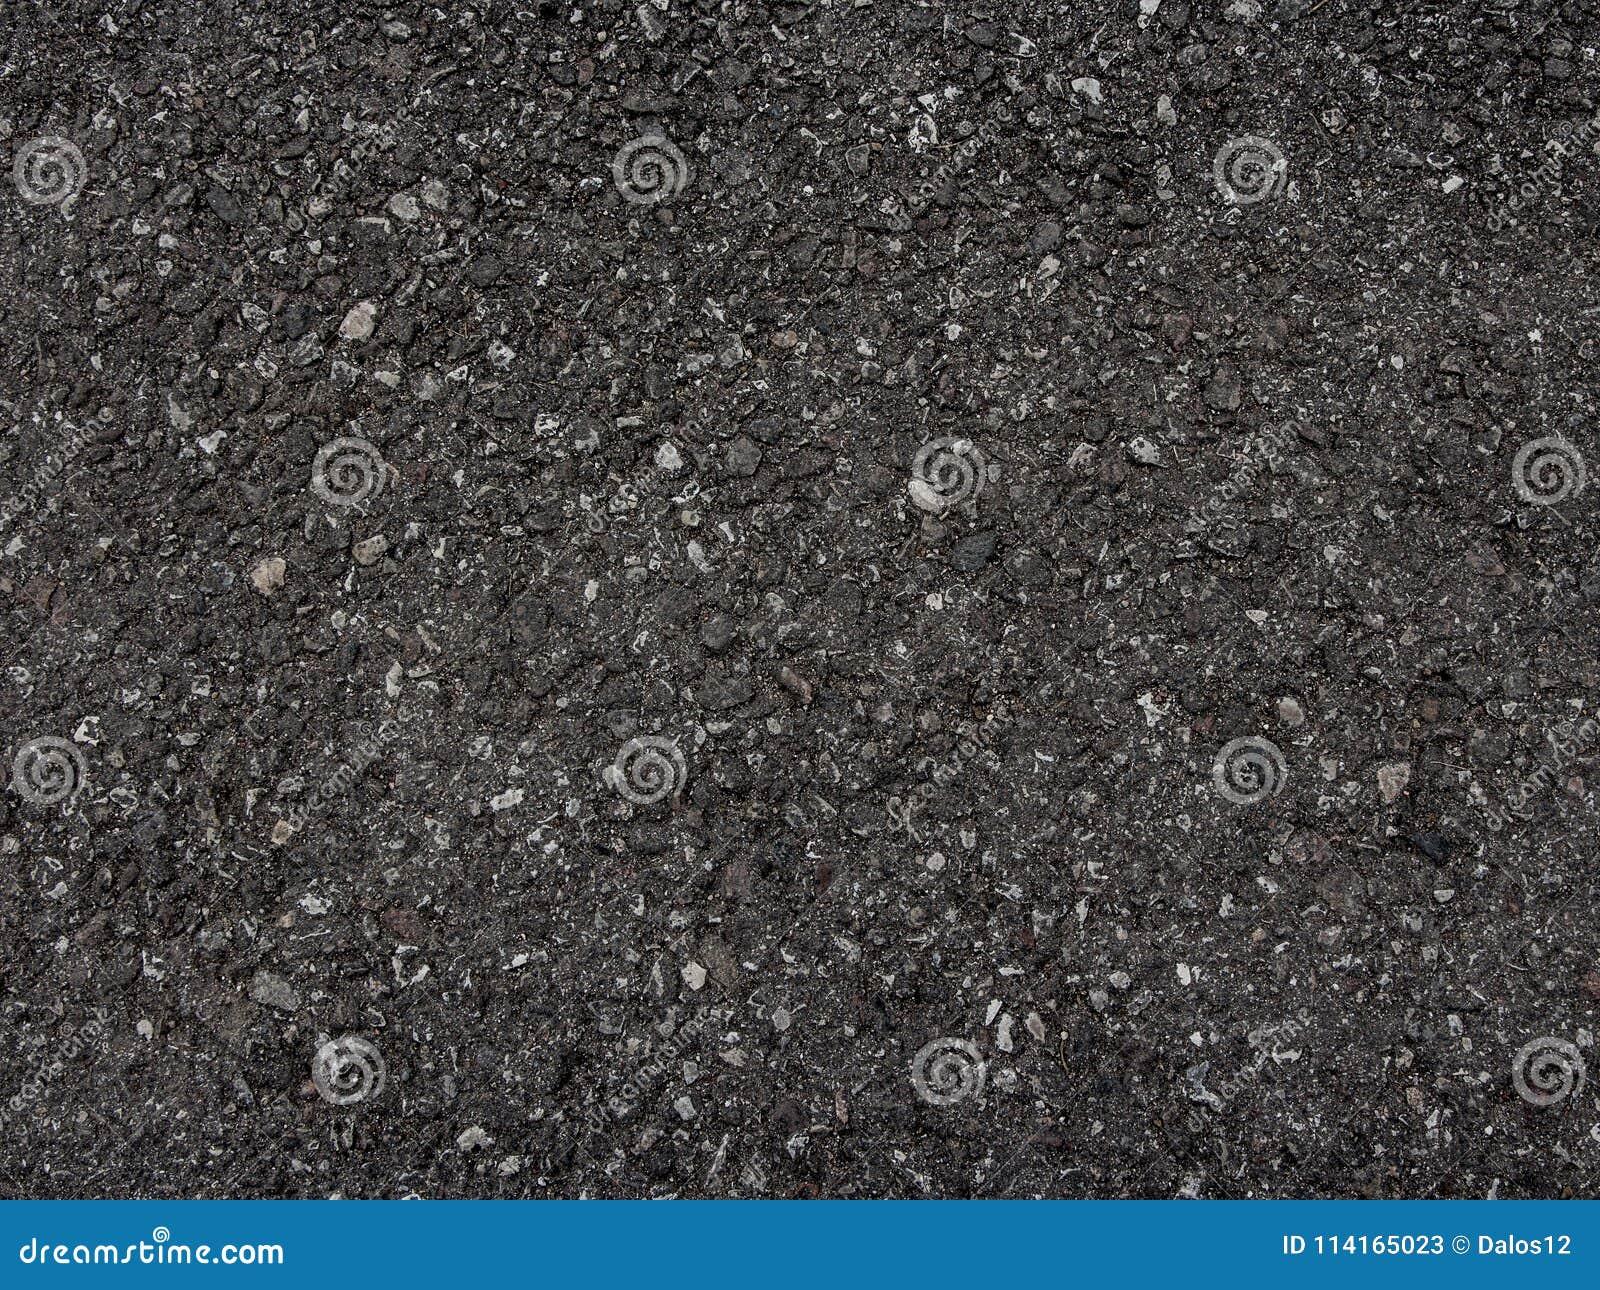 Asphalt tar tarmac texture or background stock image image of